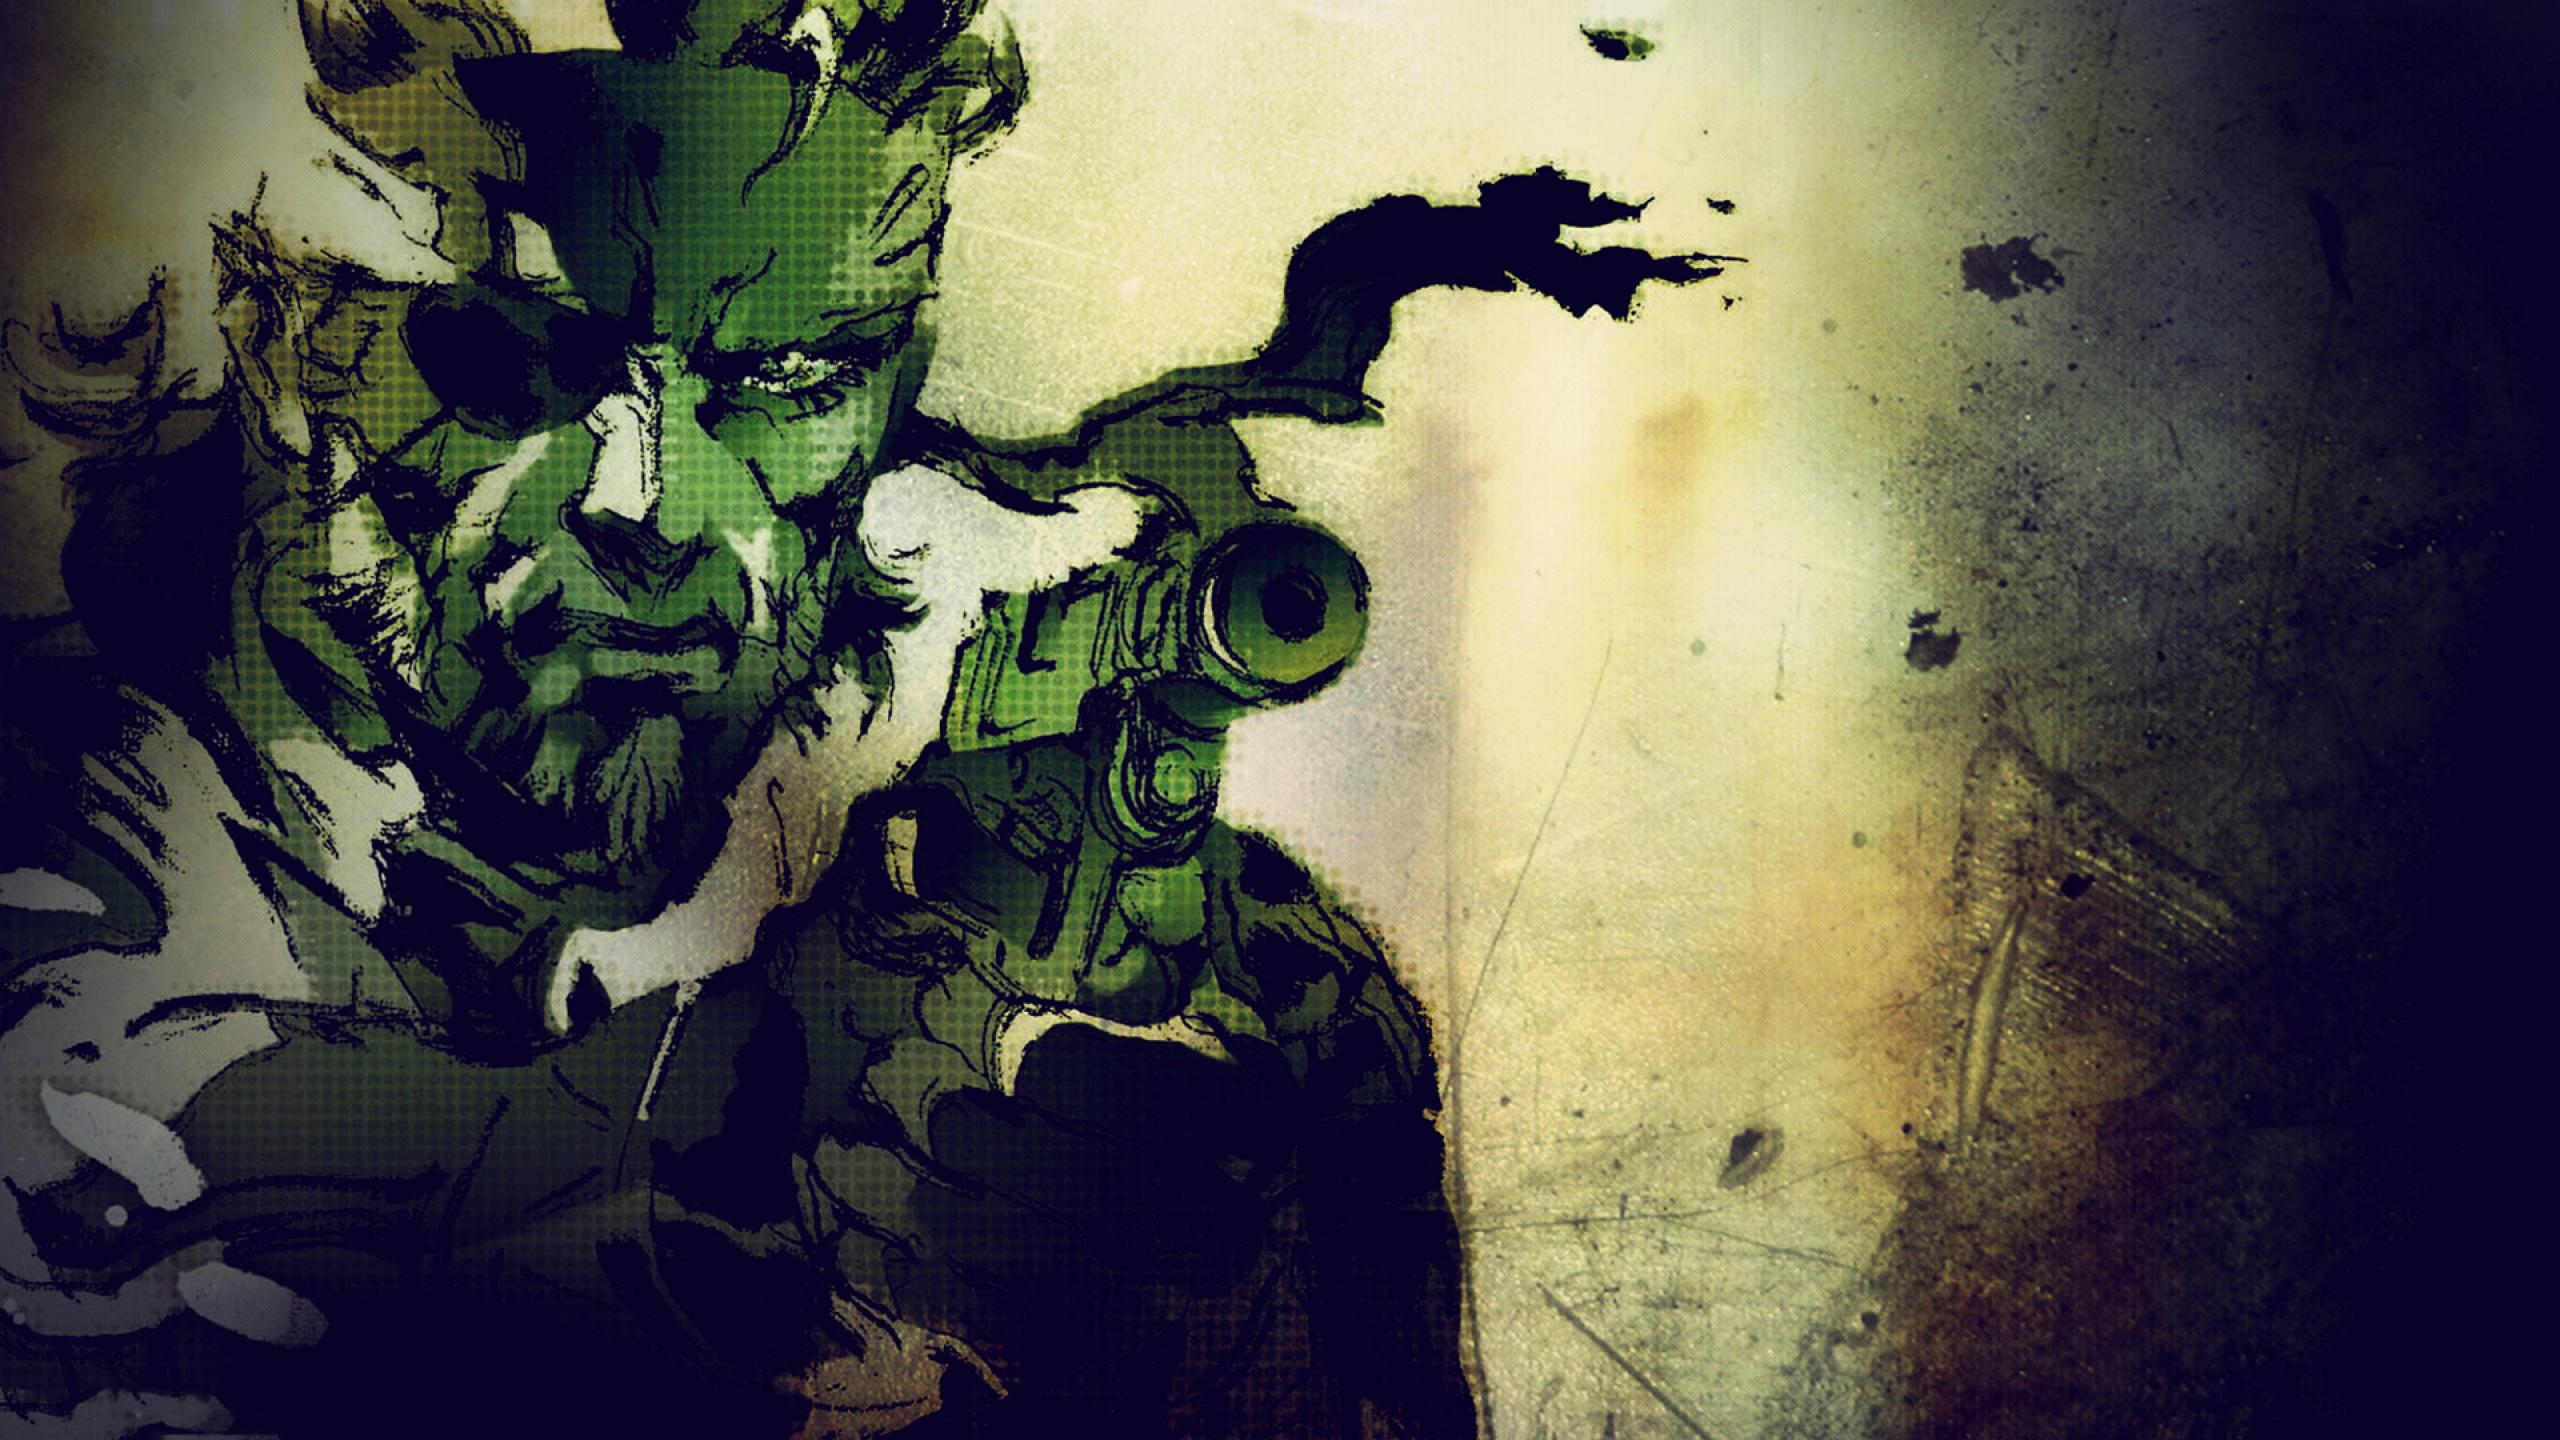 2560x1440 Metal Gear Solid 5 1440p Resolution Wallpaper Hd Games